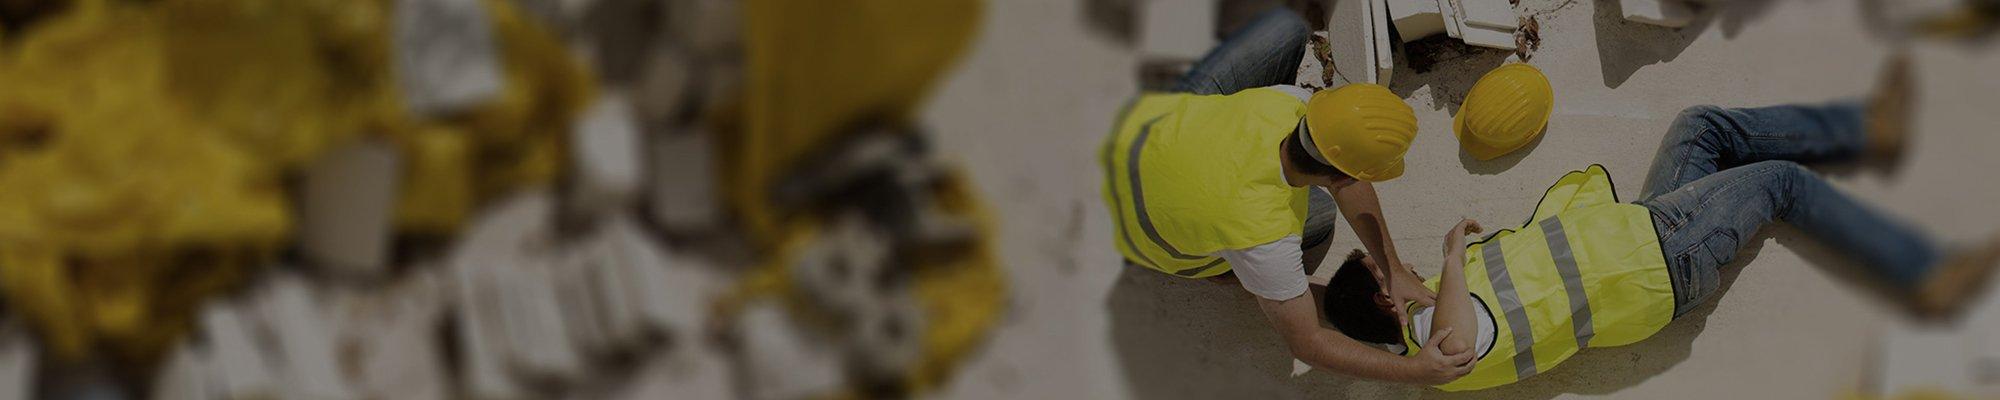 construction worker hurt on jobsite